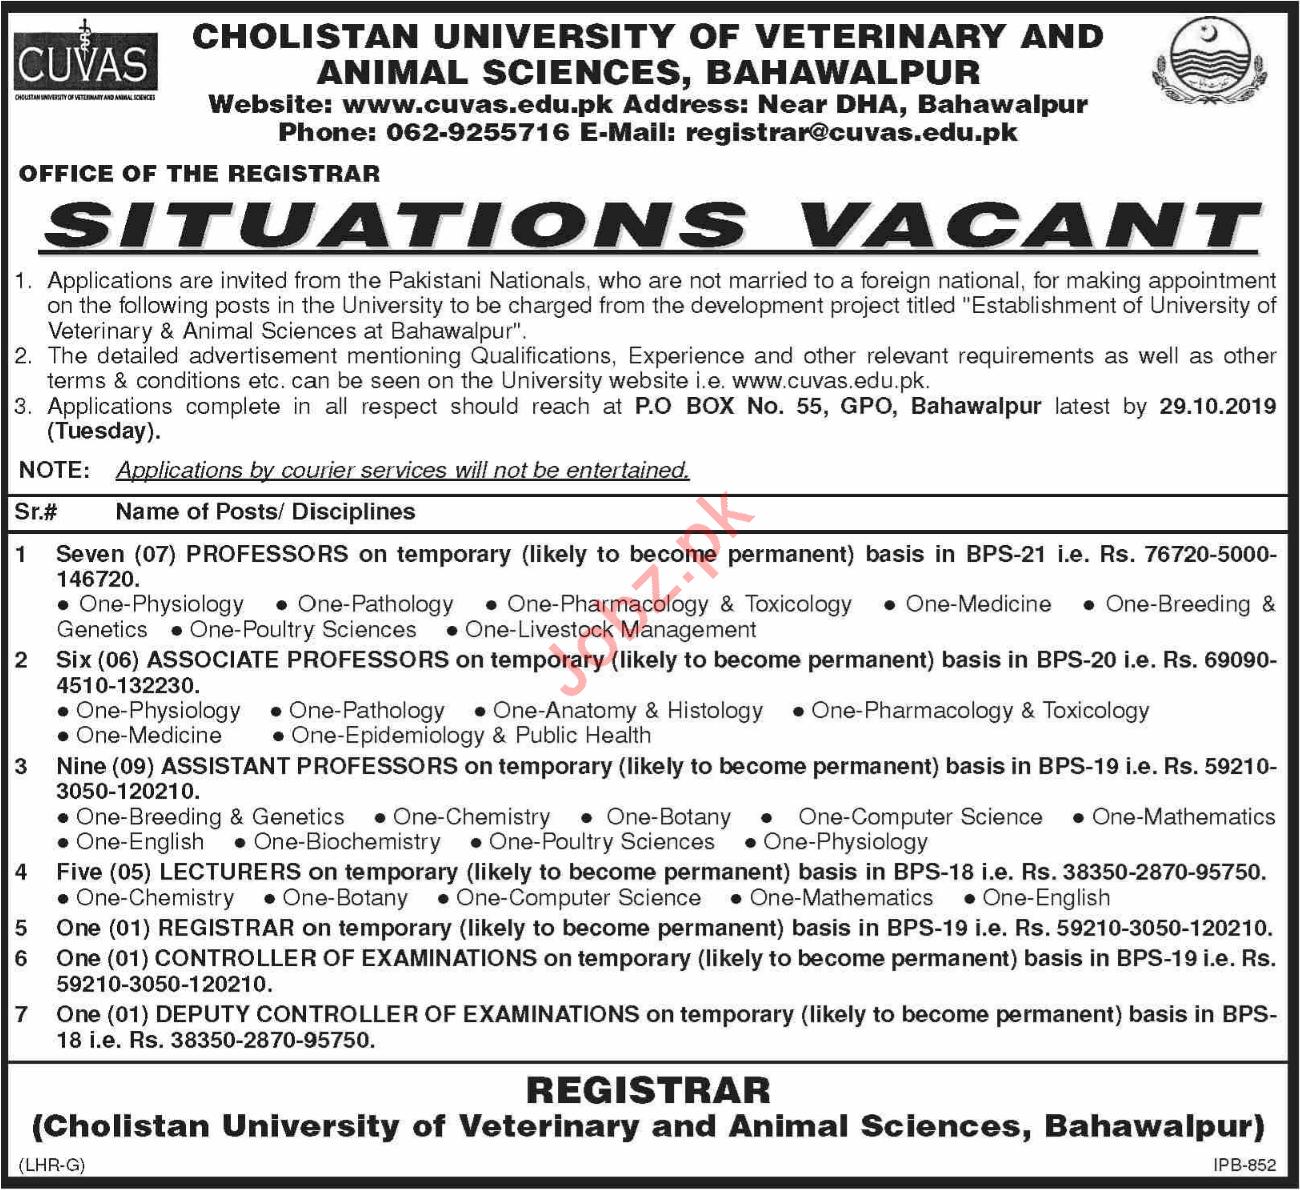 Cholistan University of Veterinary and Animal Sciences Jobs